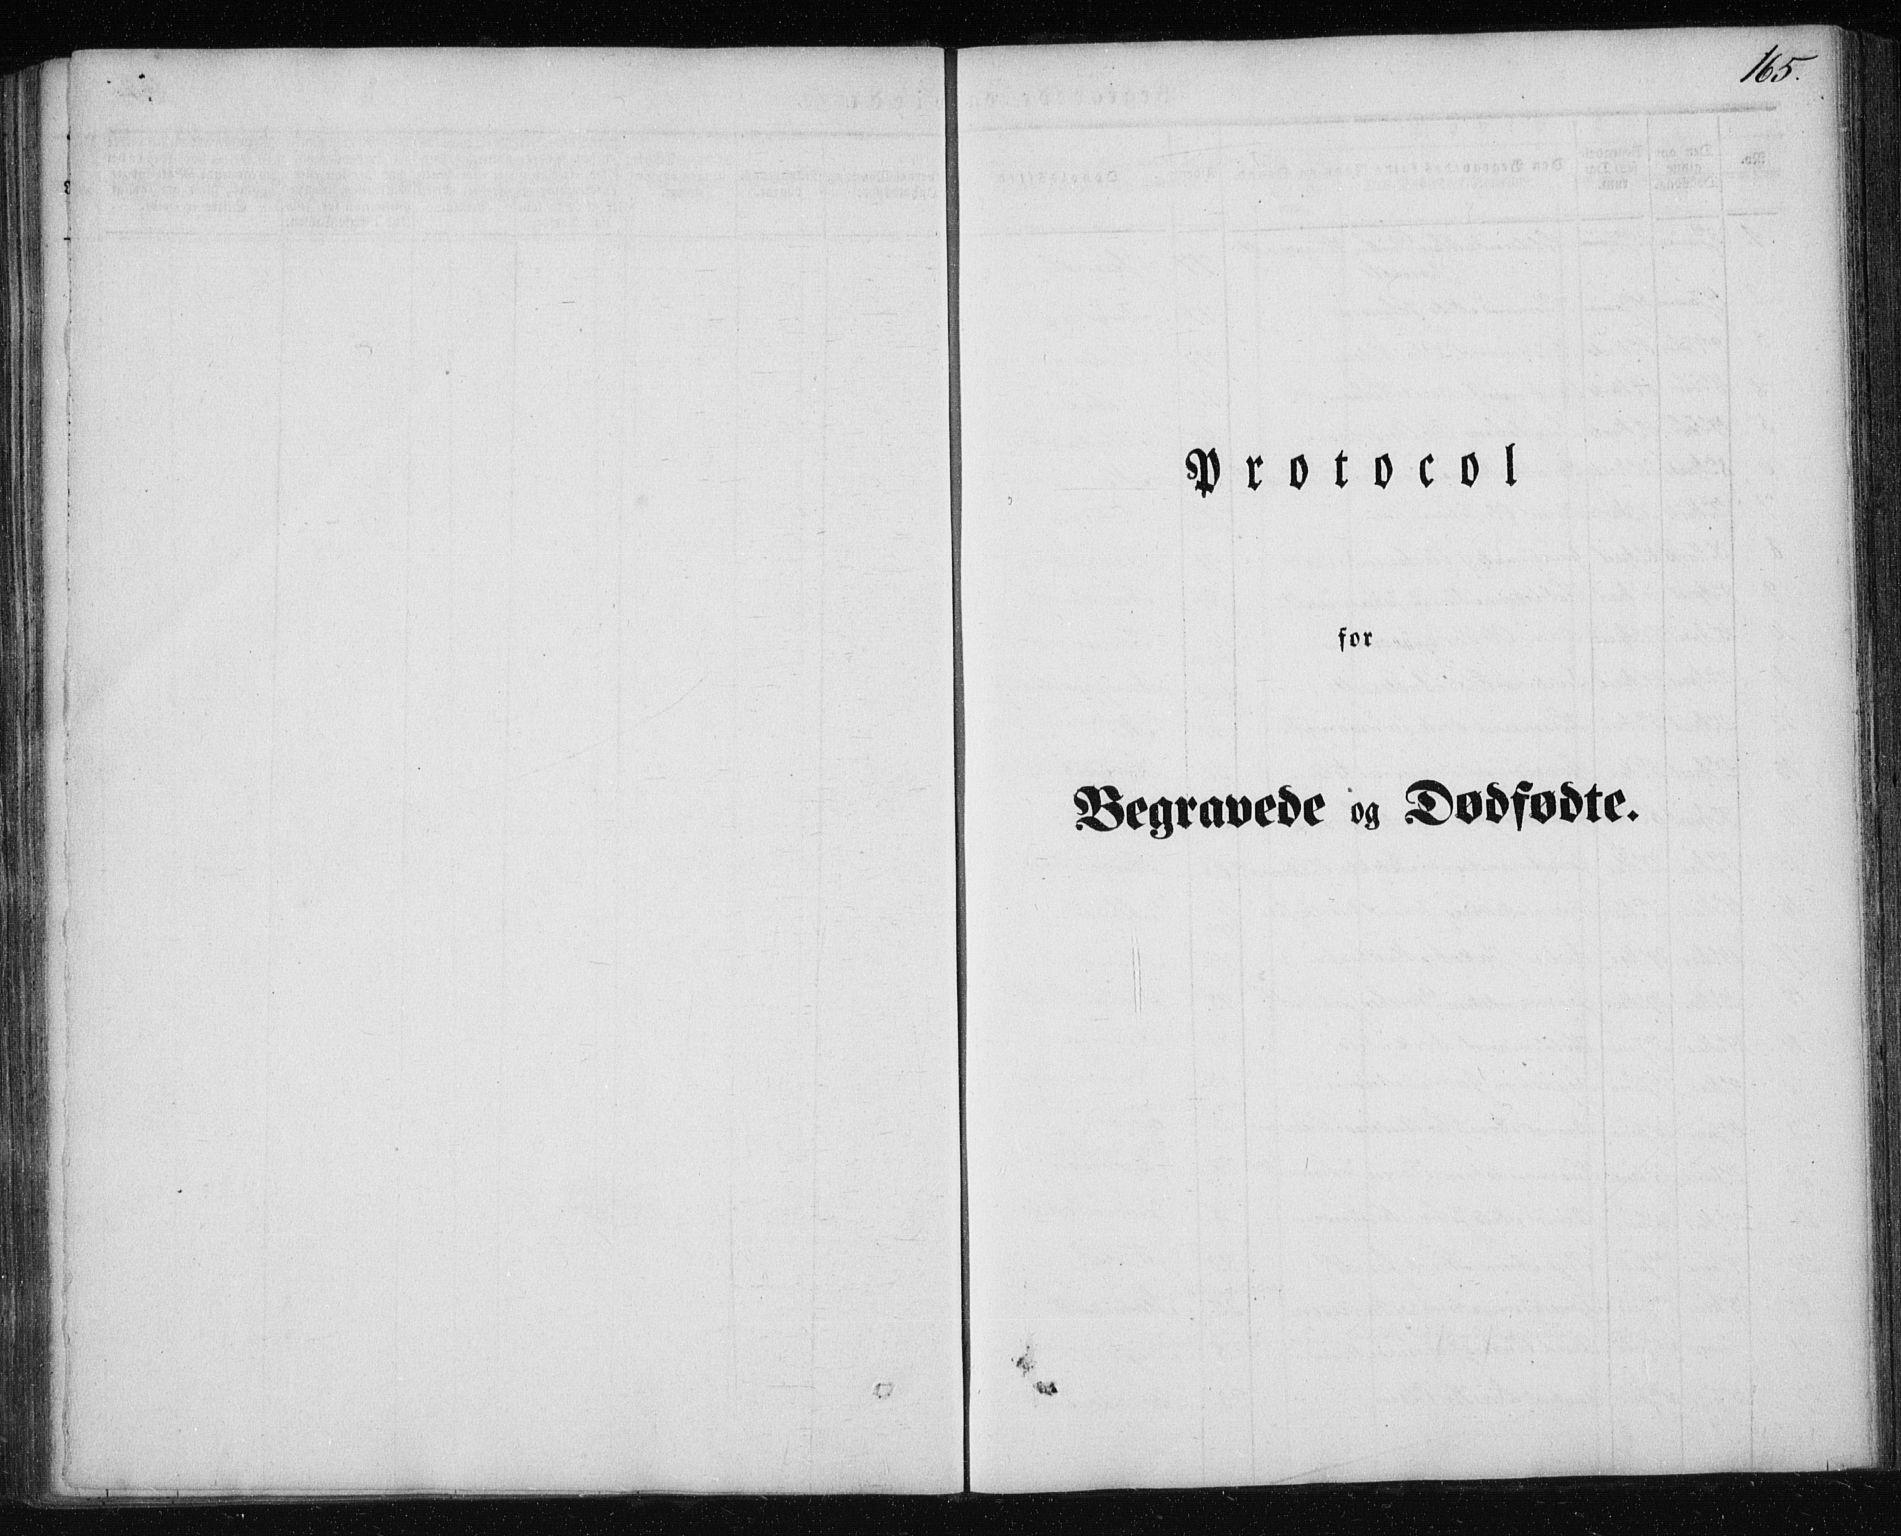 SAT, Ministerialprotokoller, klokkerbøker og fødselsregistre - Nordland, 827/L0391: Ministerialbok nr. 827A03, 1842-1852, s. 165